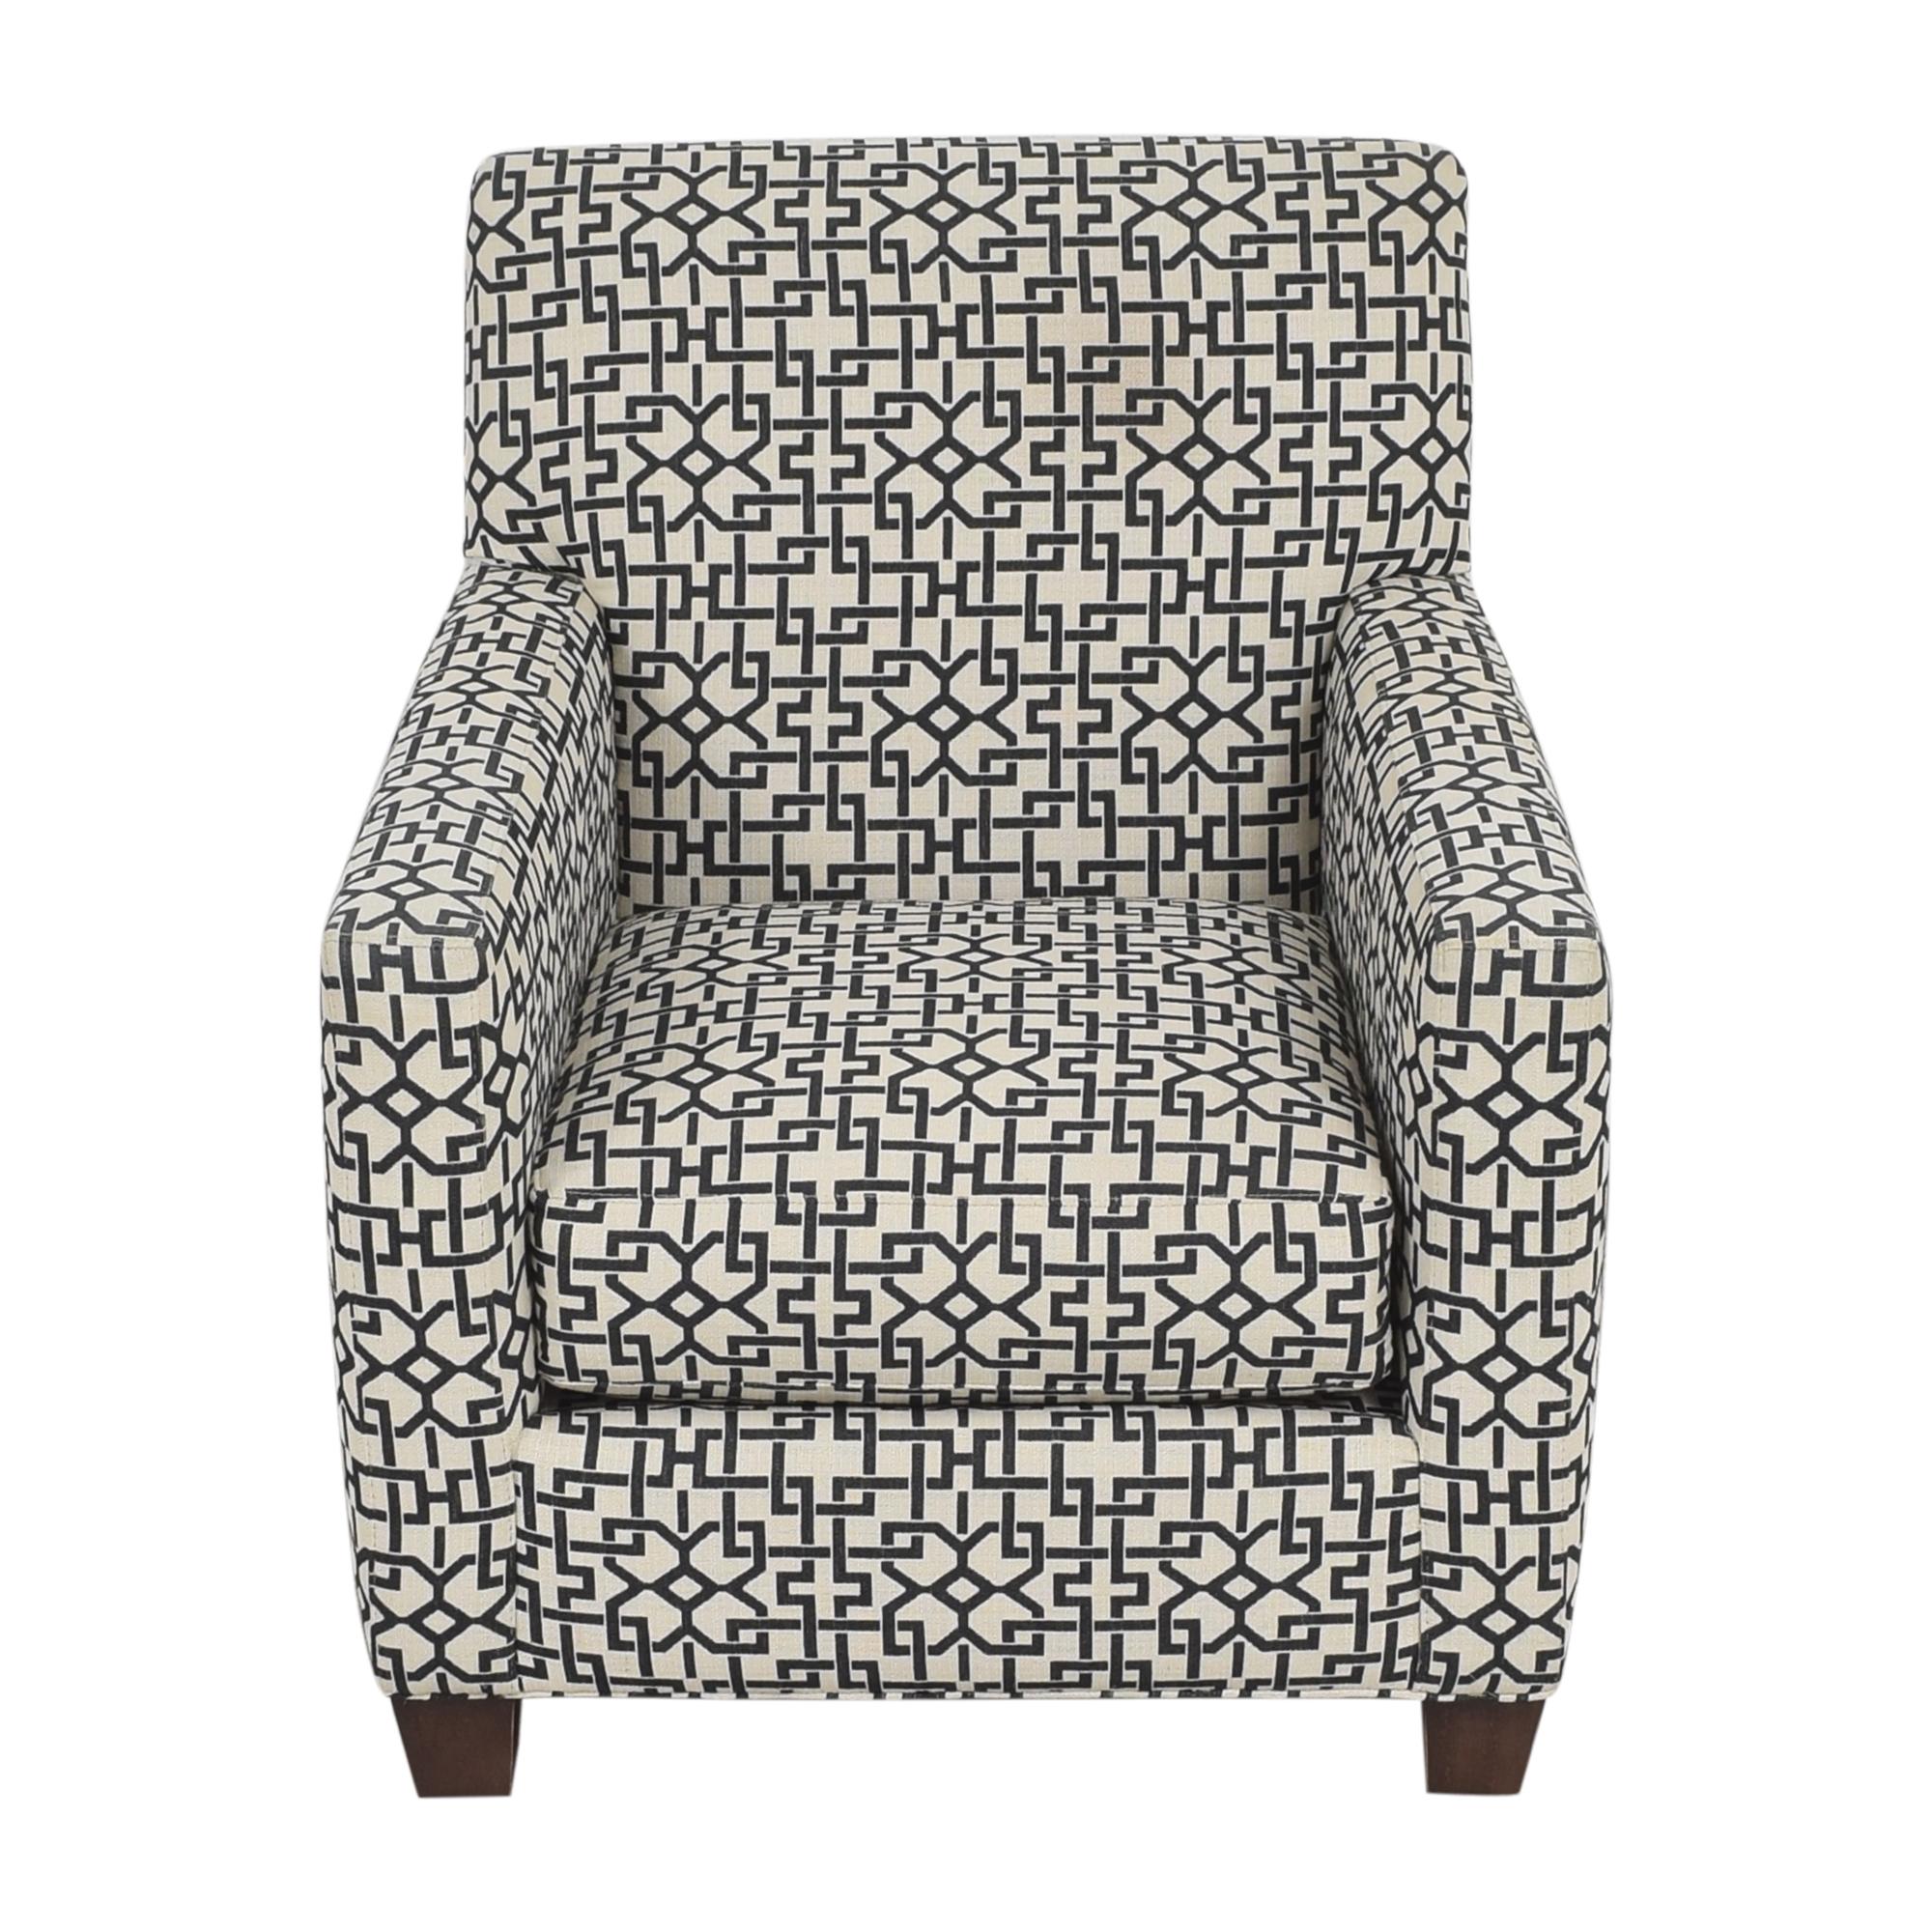 buy Crate & Barrel Geometric Club Chair Crate & Barrel Chairs